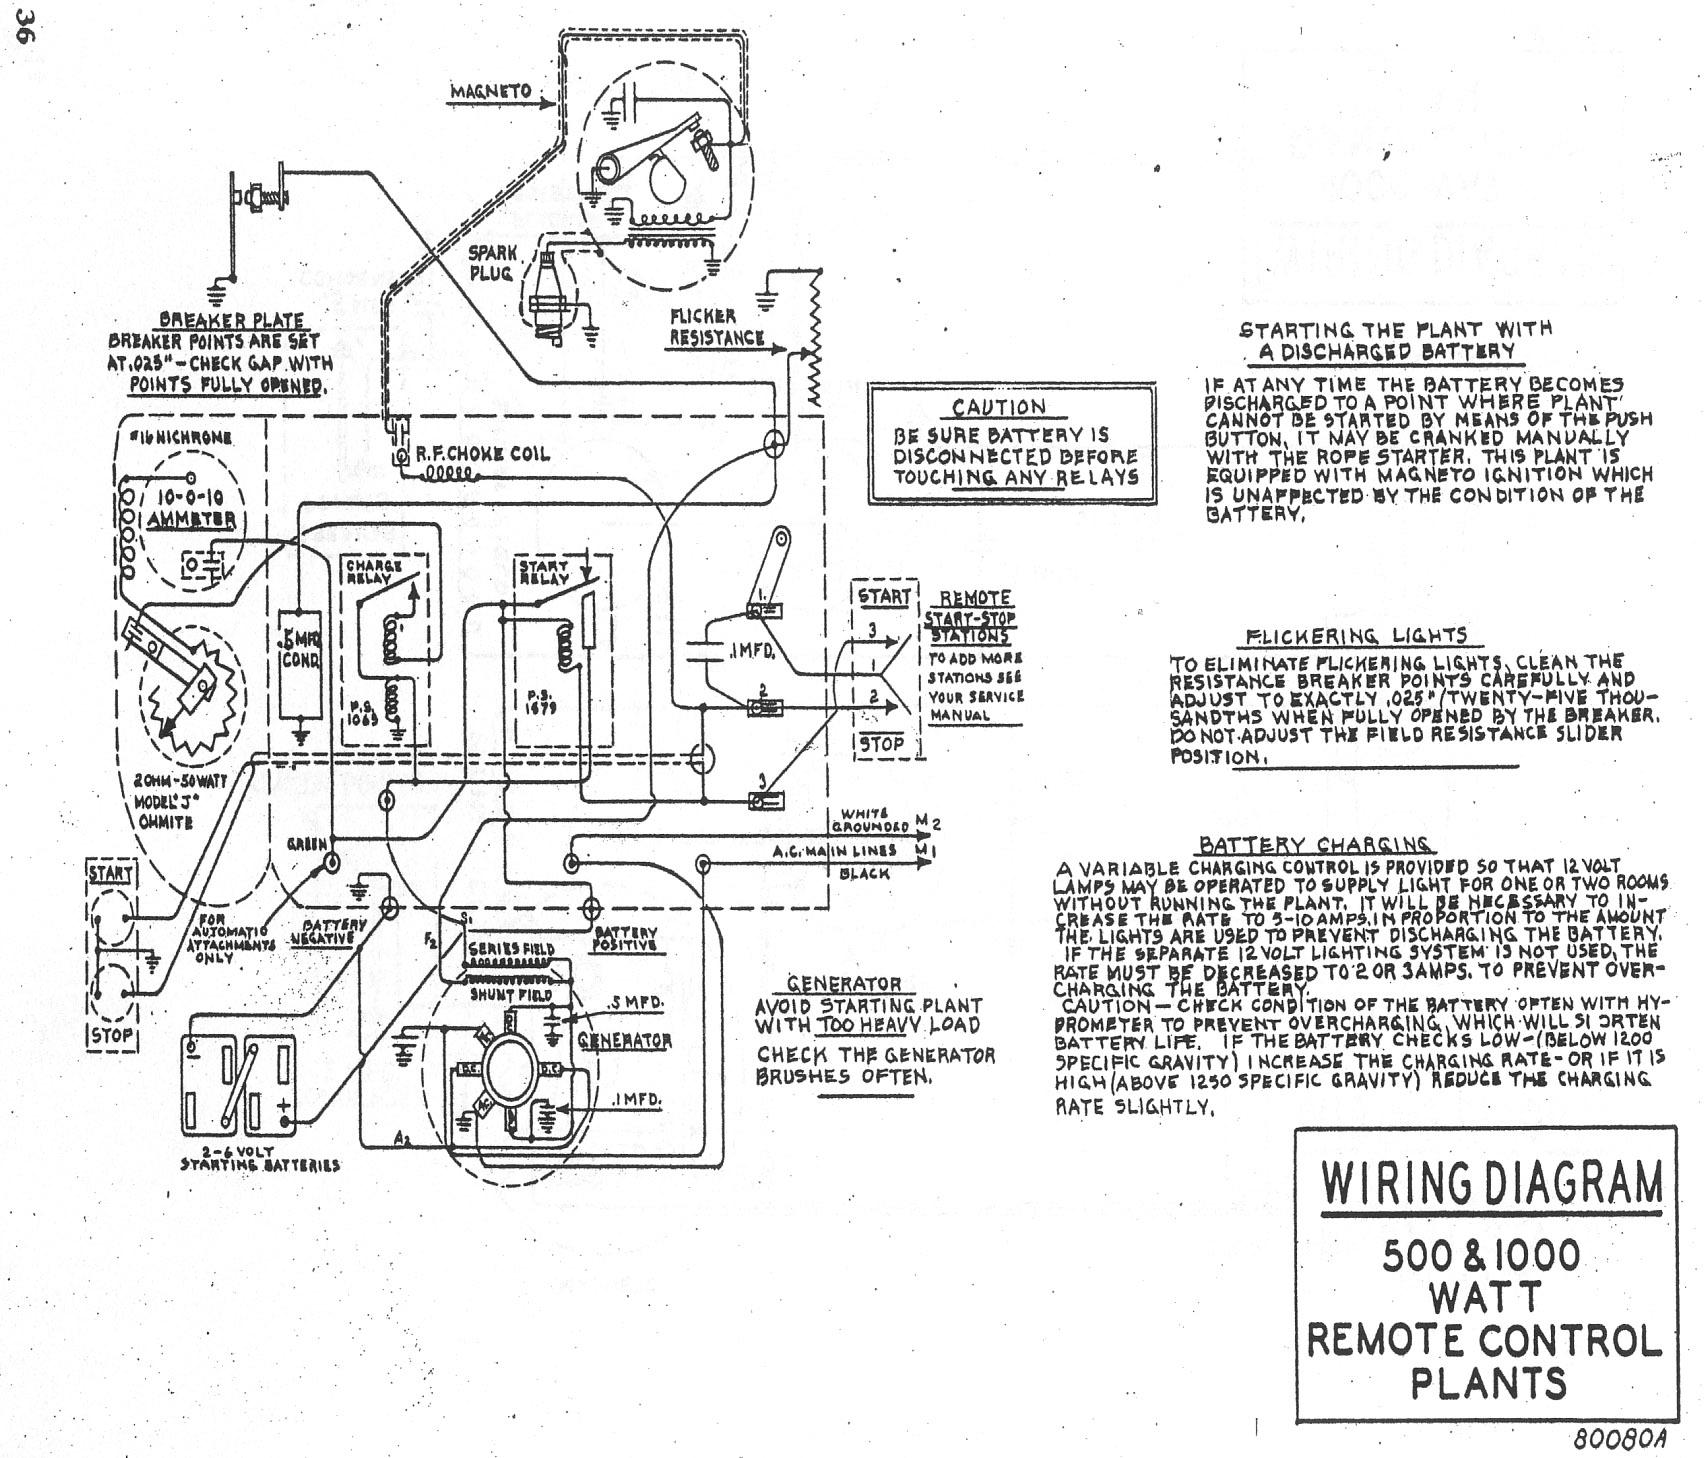 wiring diagram onan genset 2002 ford windstar belt rv generator free engine image for